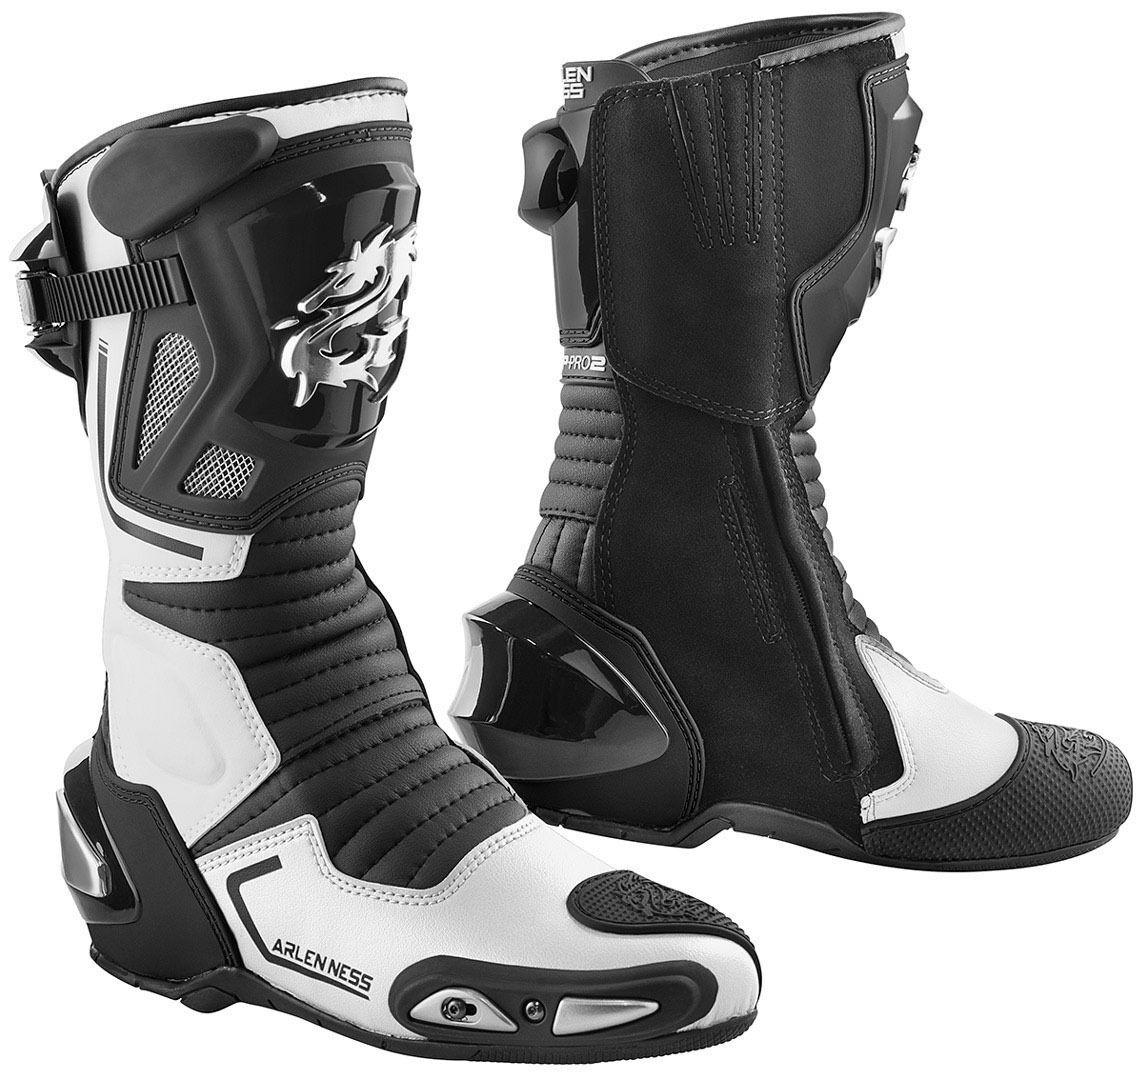 Arlen Ness Sugello Bottes de moto Noir Blanc taille : 47